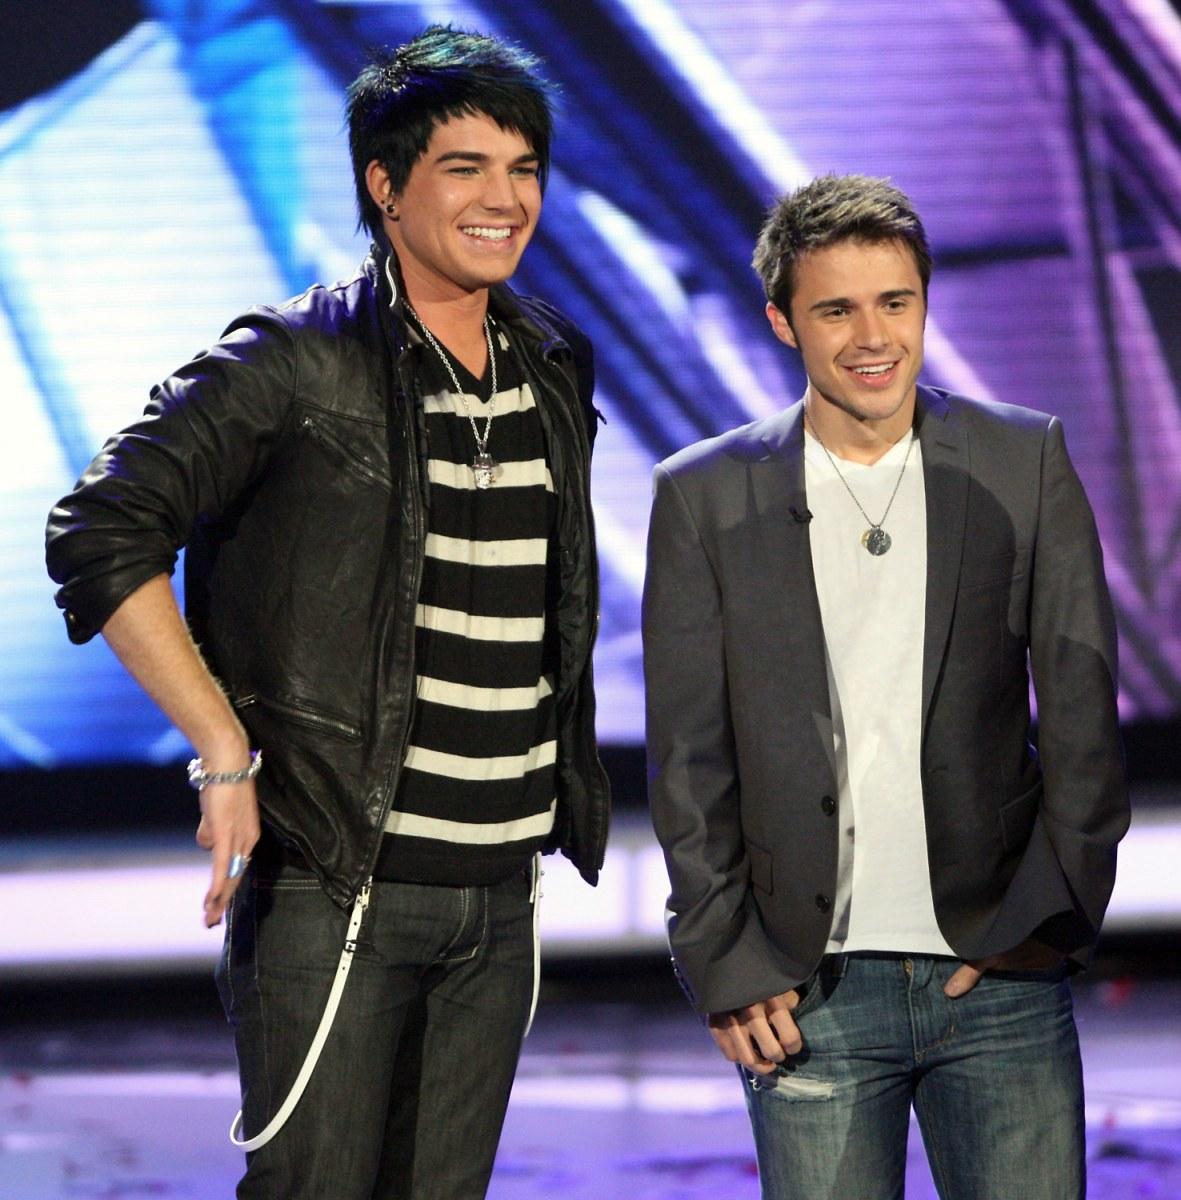 American Idol Season 8 Top 3 Elimination Show